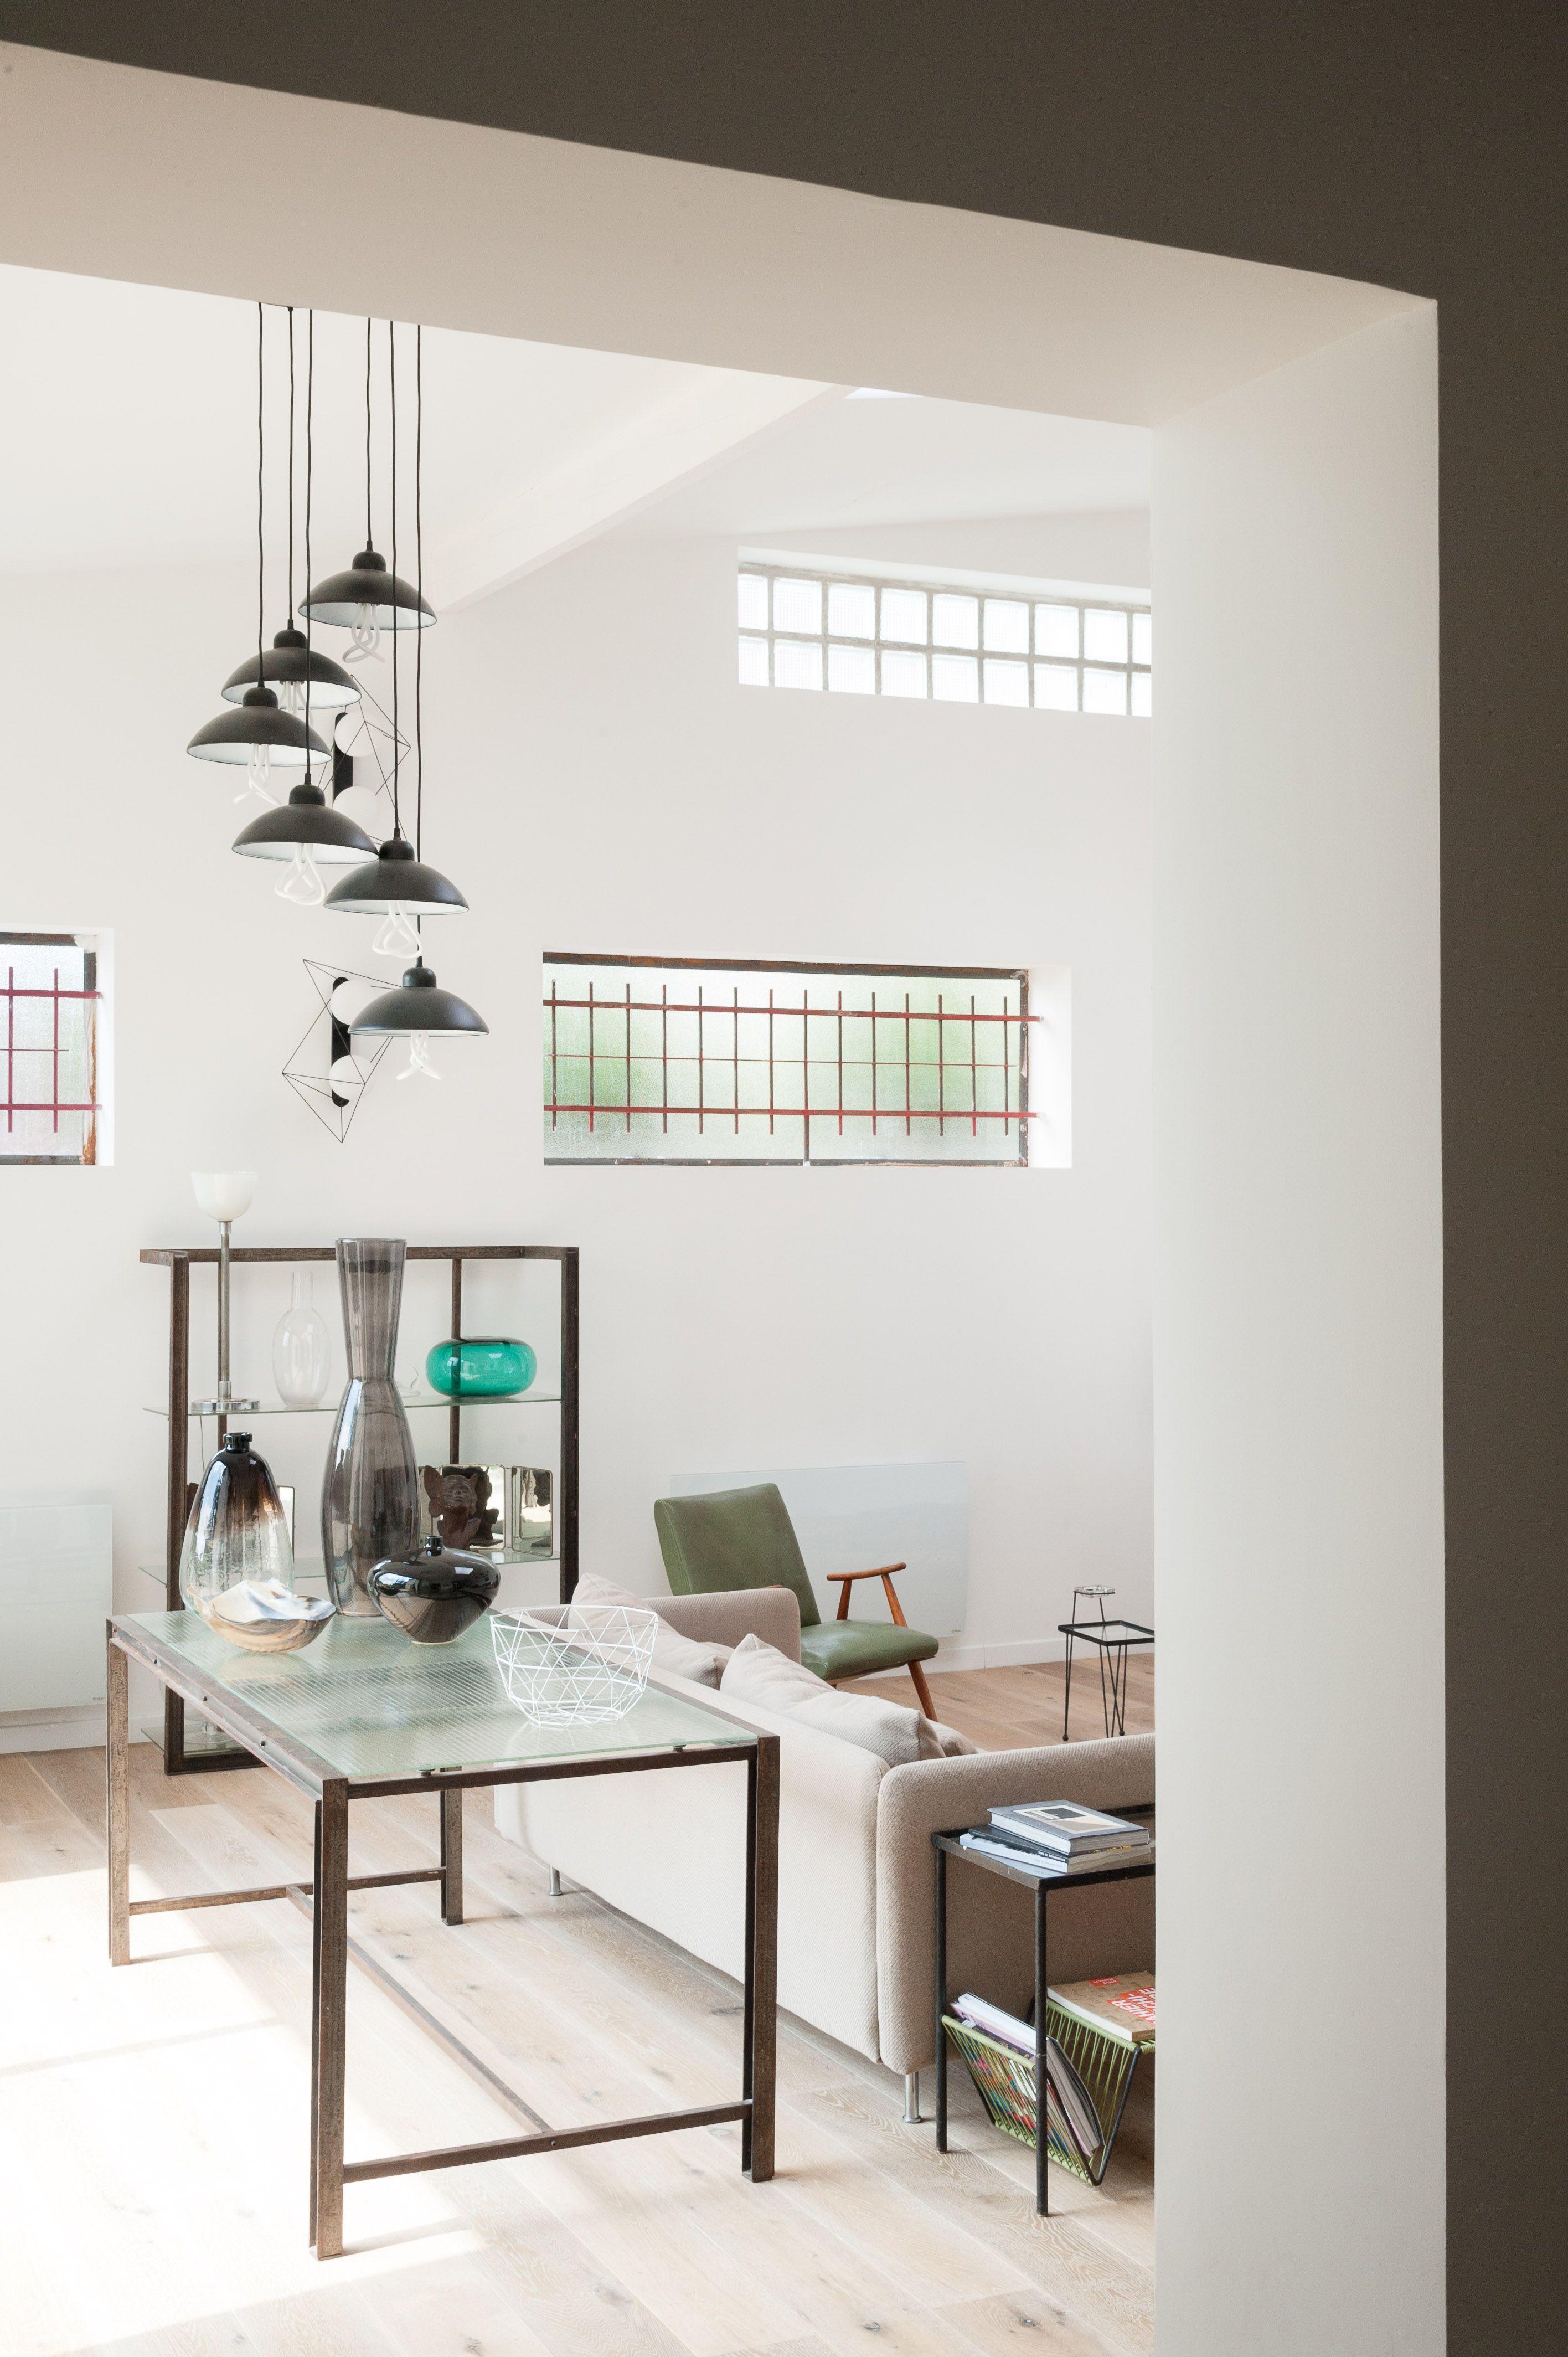 alice b rencontre un archi archi salon d coration. Black Bedroom Furniture Sets. Home Design Ideas